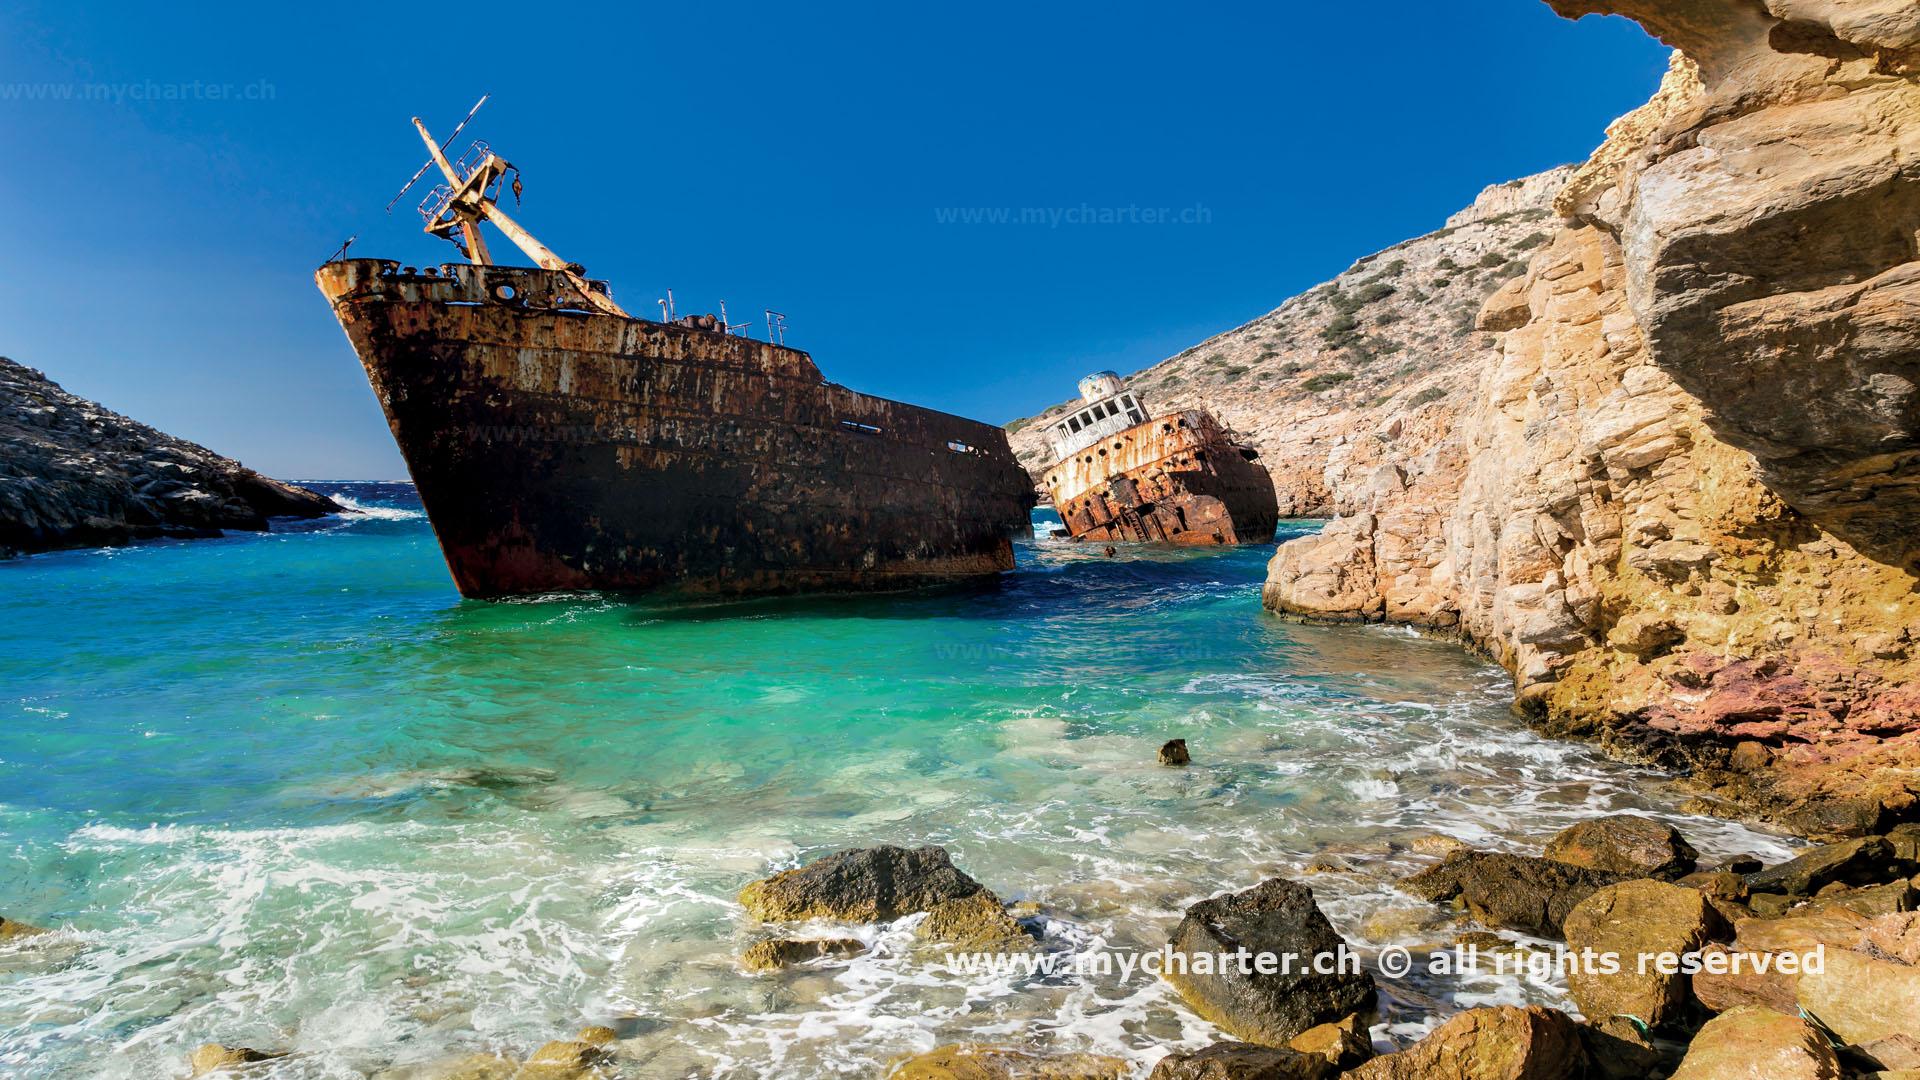 Griechenland - Amorgos